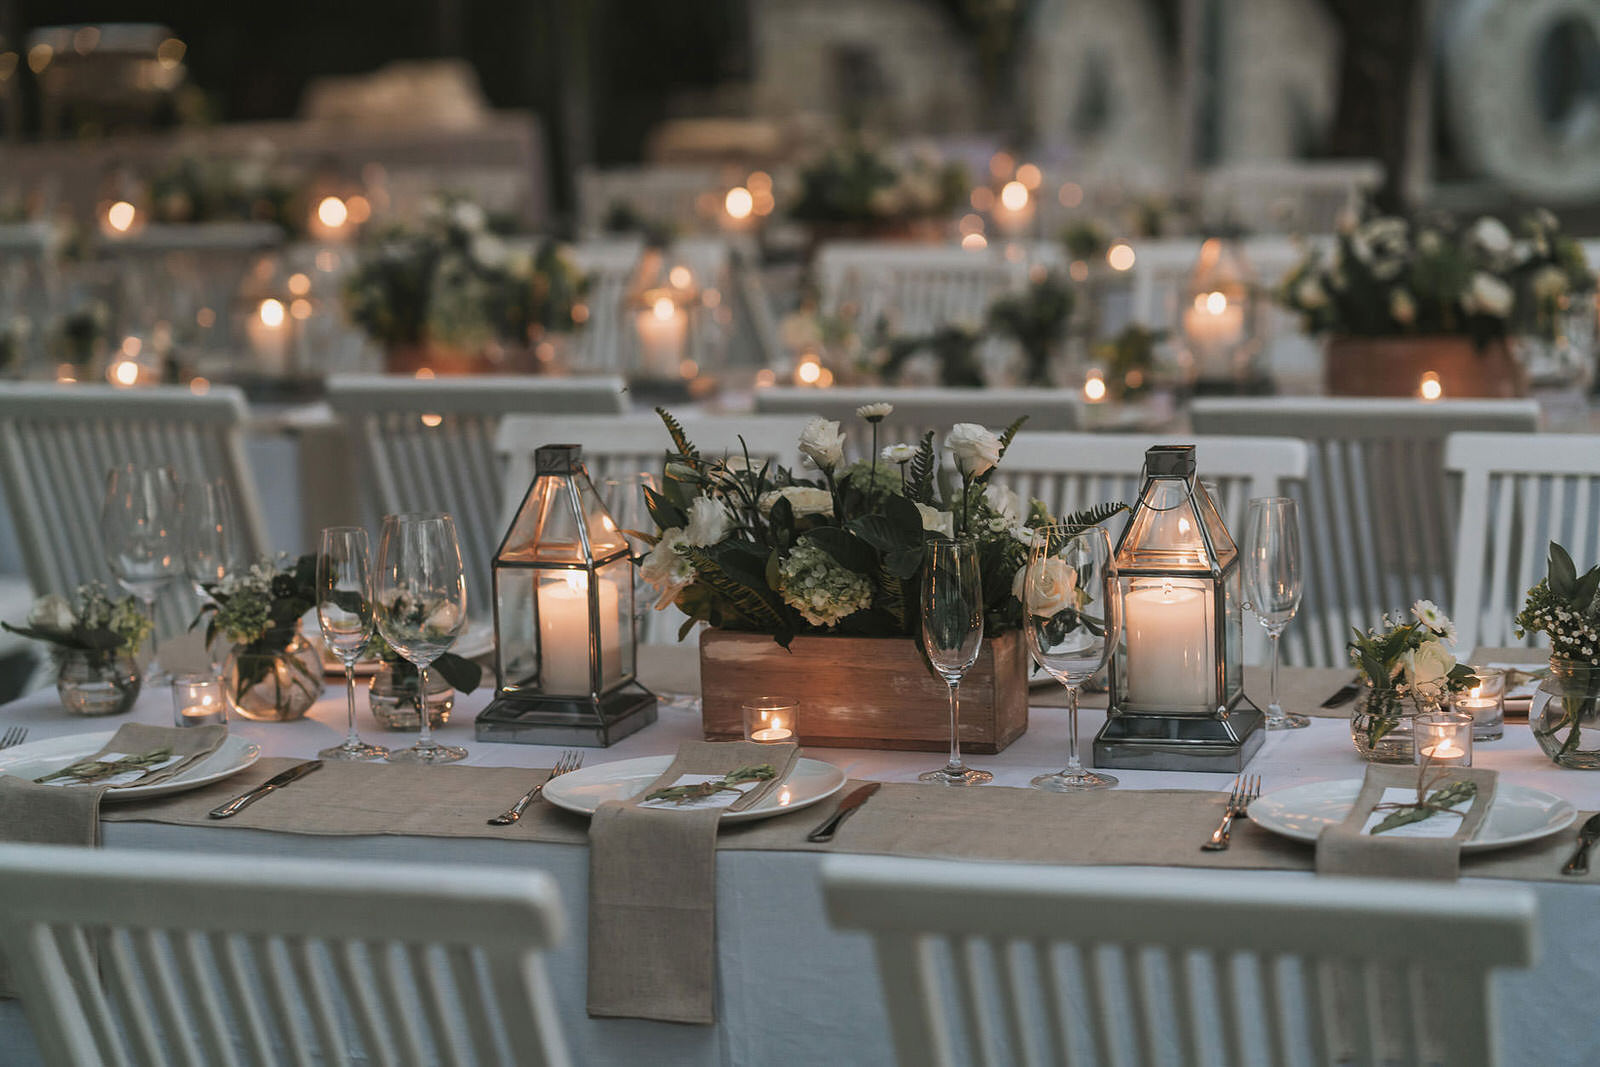 newfound-hai-tide-nusa-lembongan-bali-wedding-photographers-140